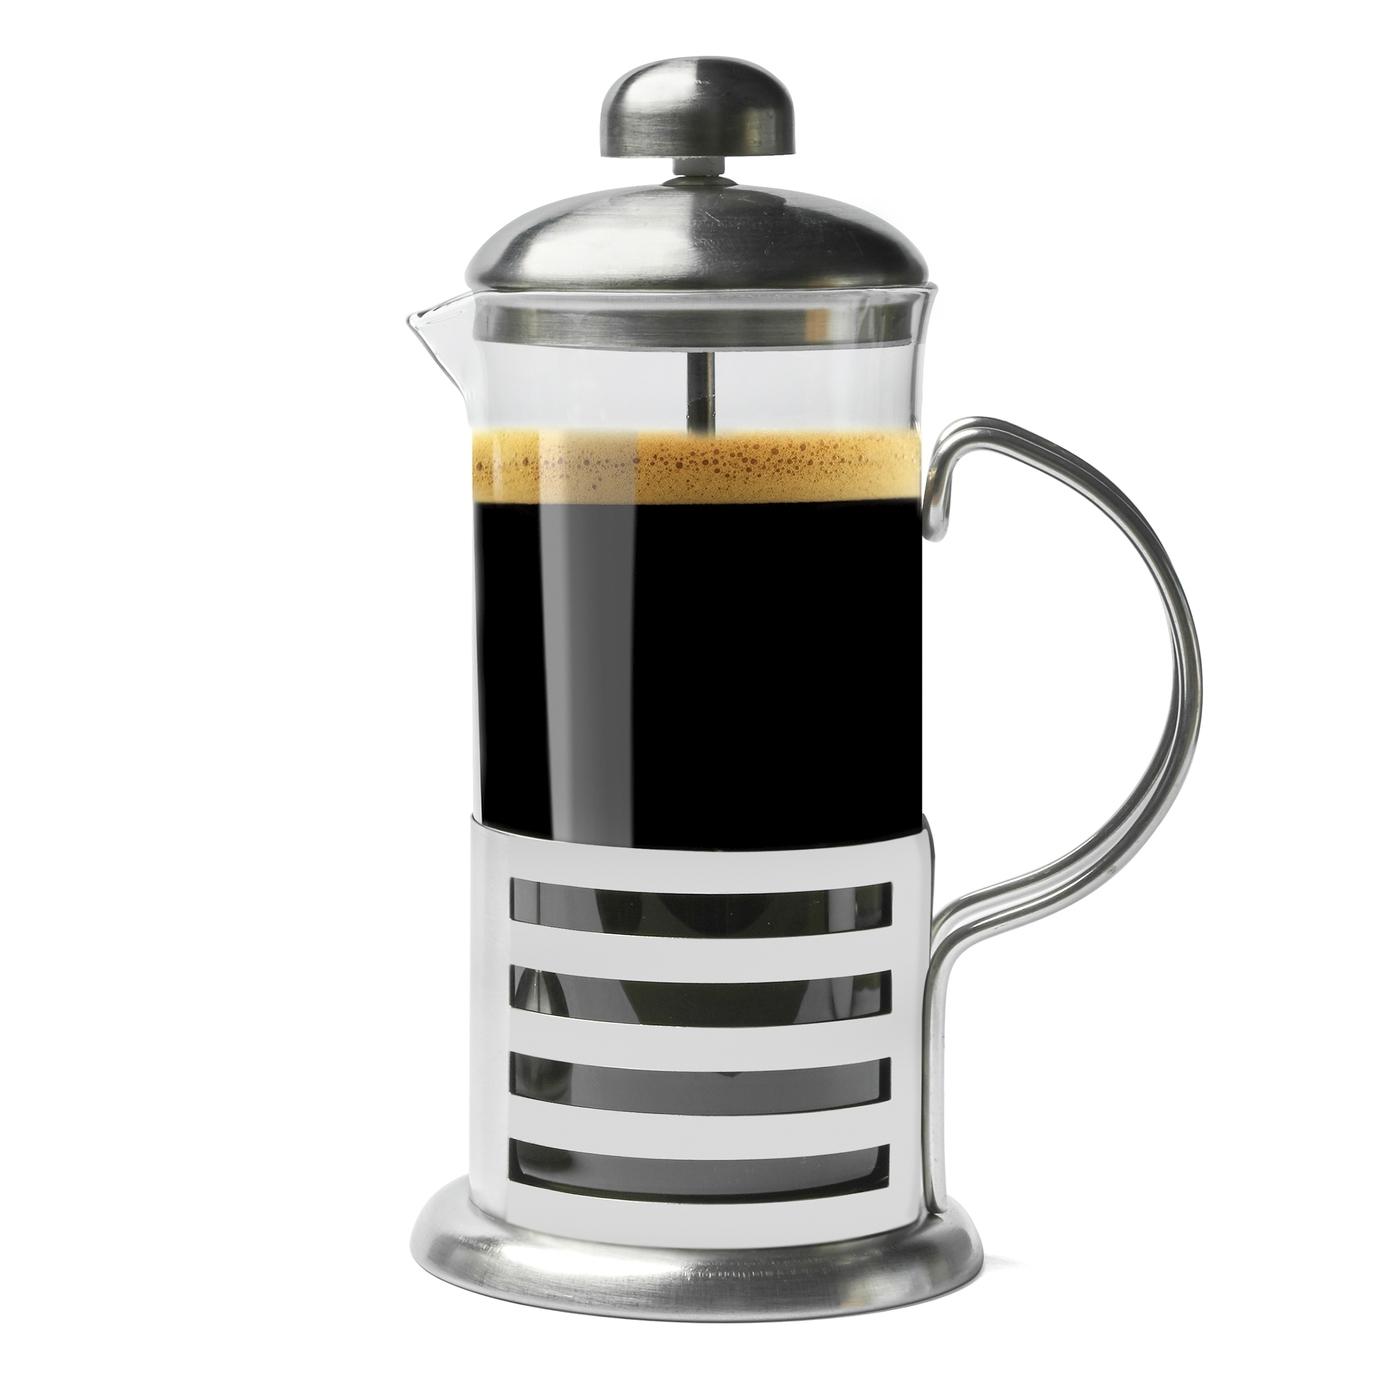 konvice 0,35l ARABICA, COFFEE MAKER, sklo+NR